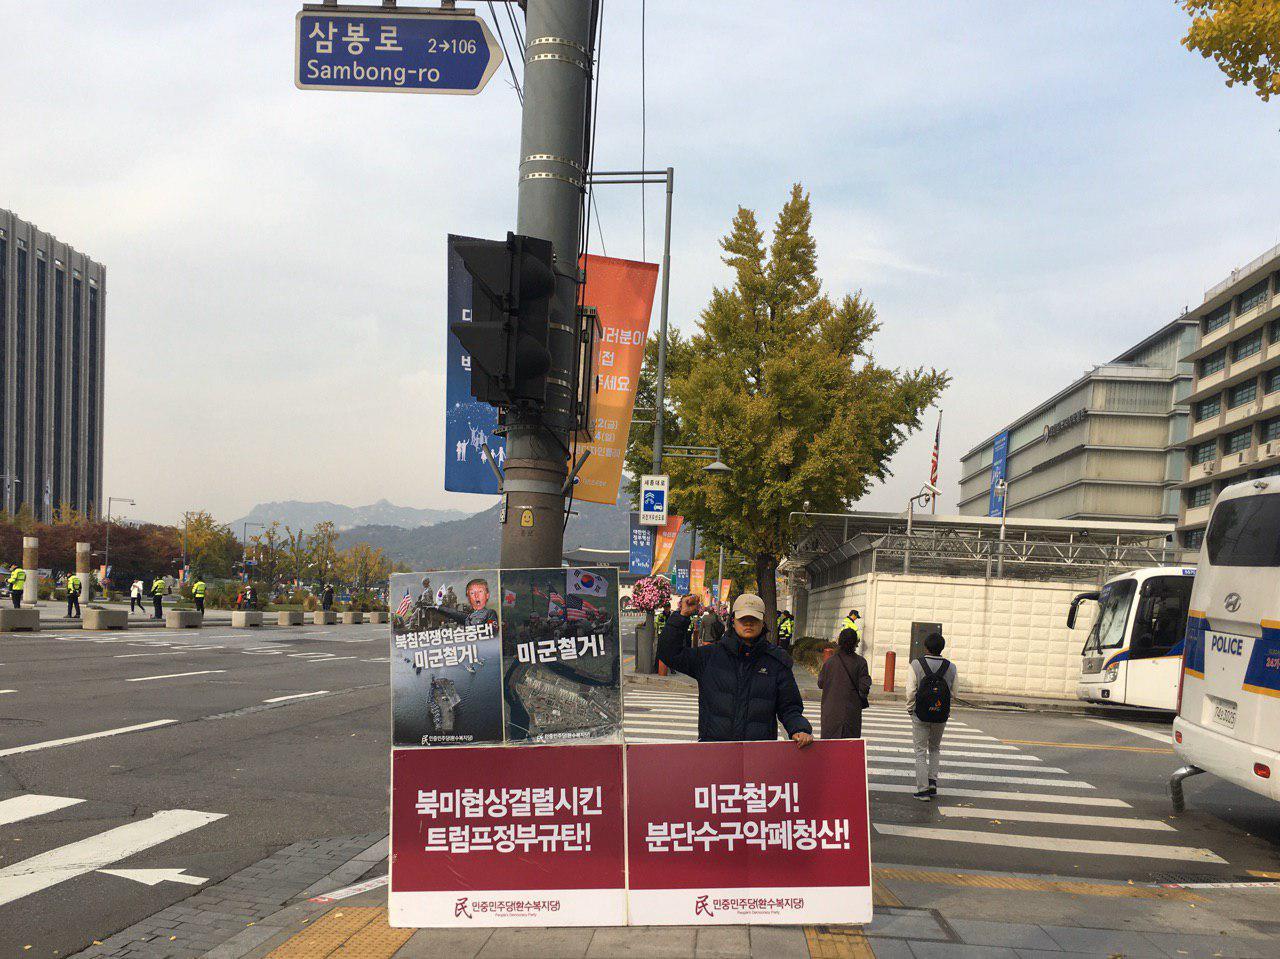 photo_2019-11-06_06-00-23.jpg